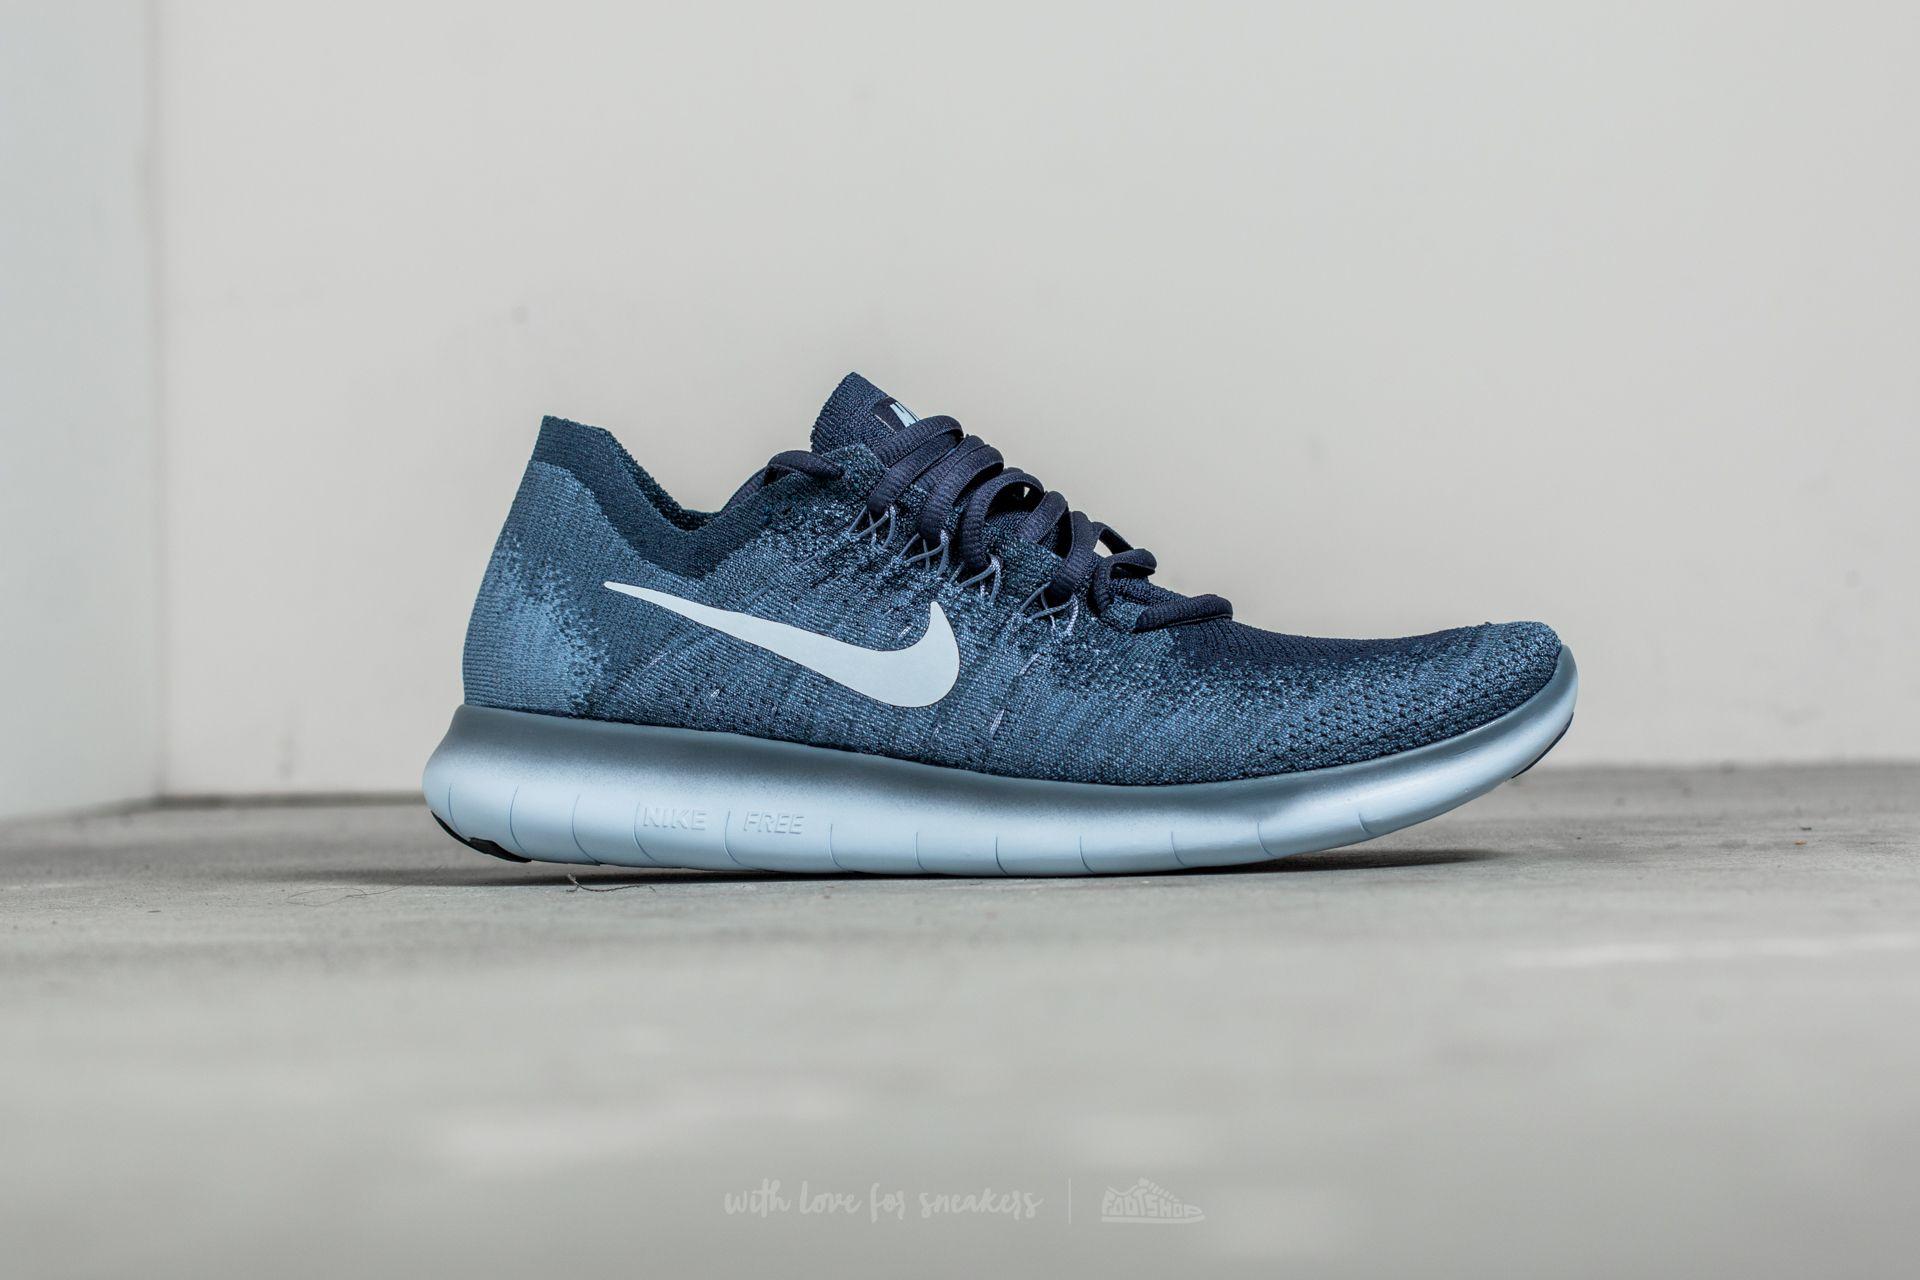 Nike Free RN Flyknit 2017 Laufschuhe, Nike Free RN, Work